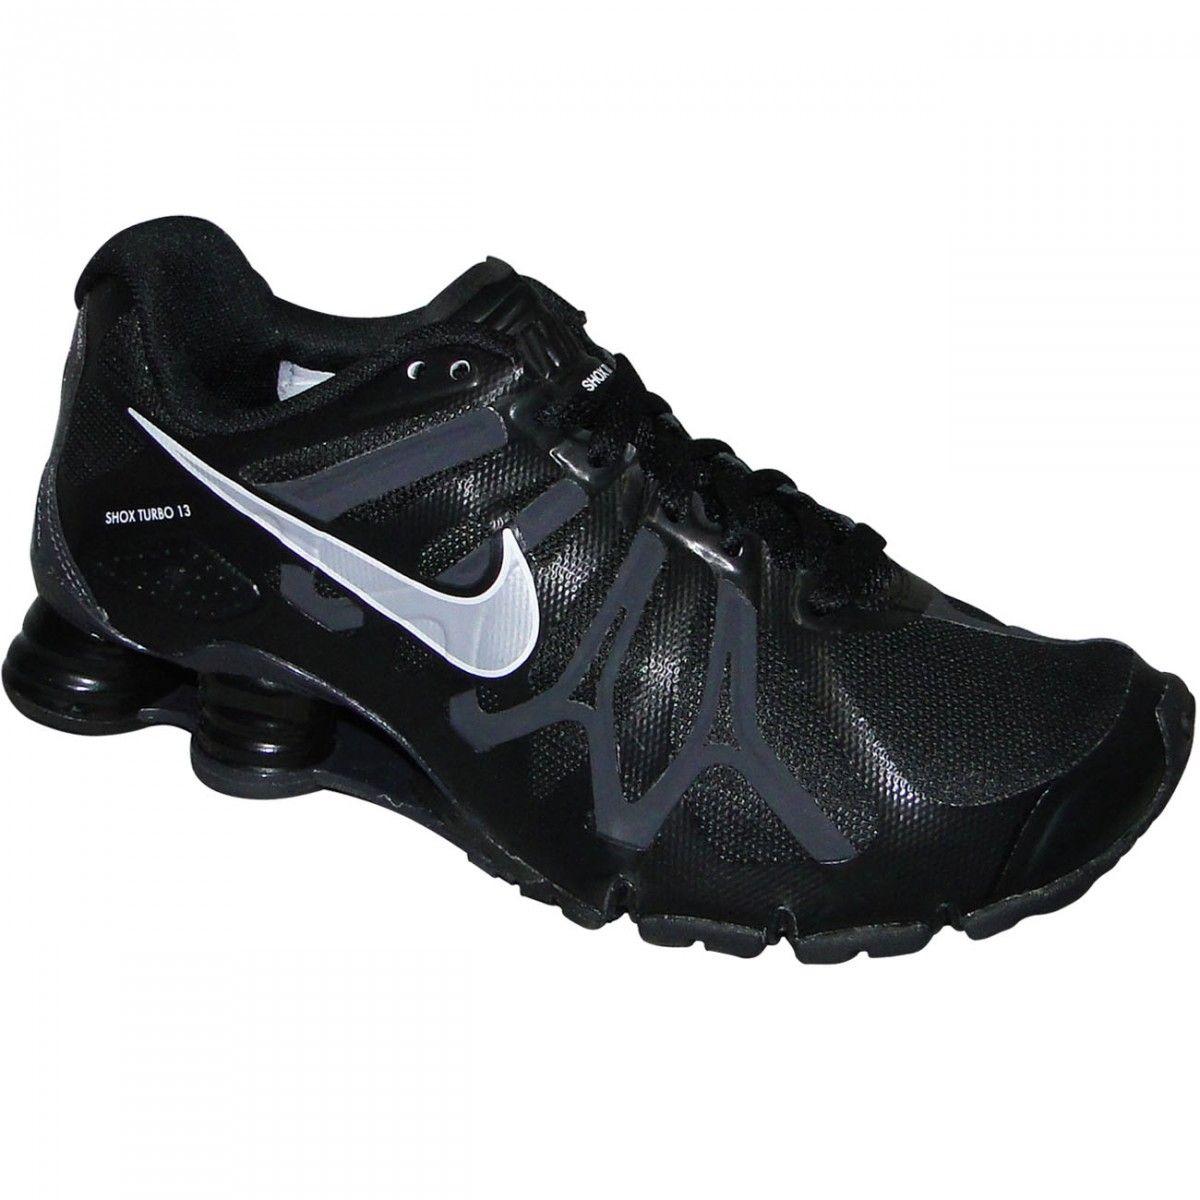 54569ade1ed3 Nike Mens Shox Turbo 13 Running